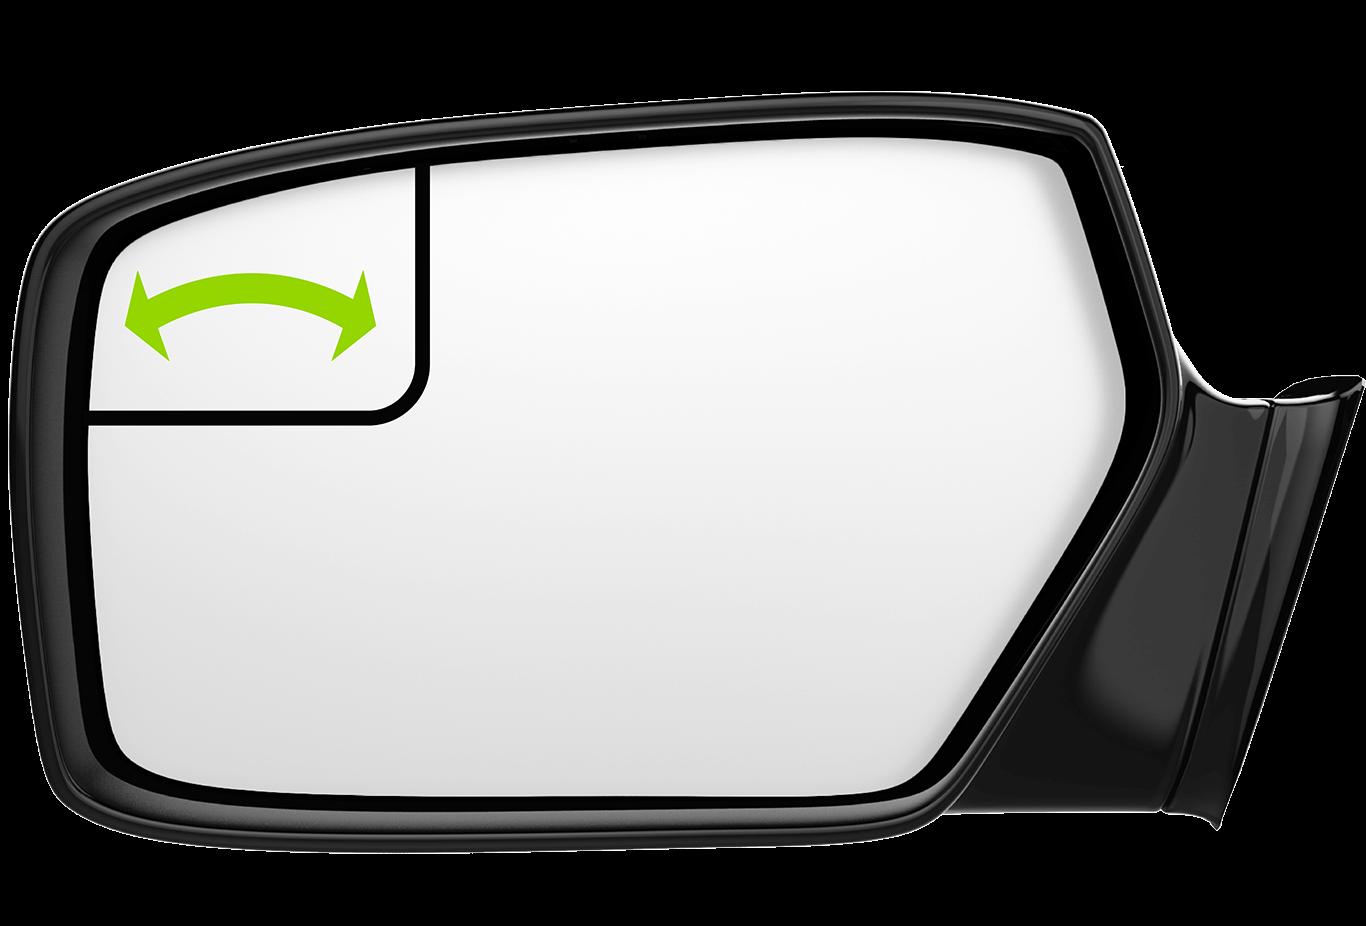 mirror clipart reflexive pronoun